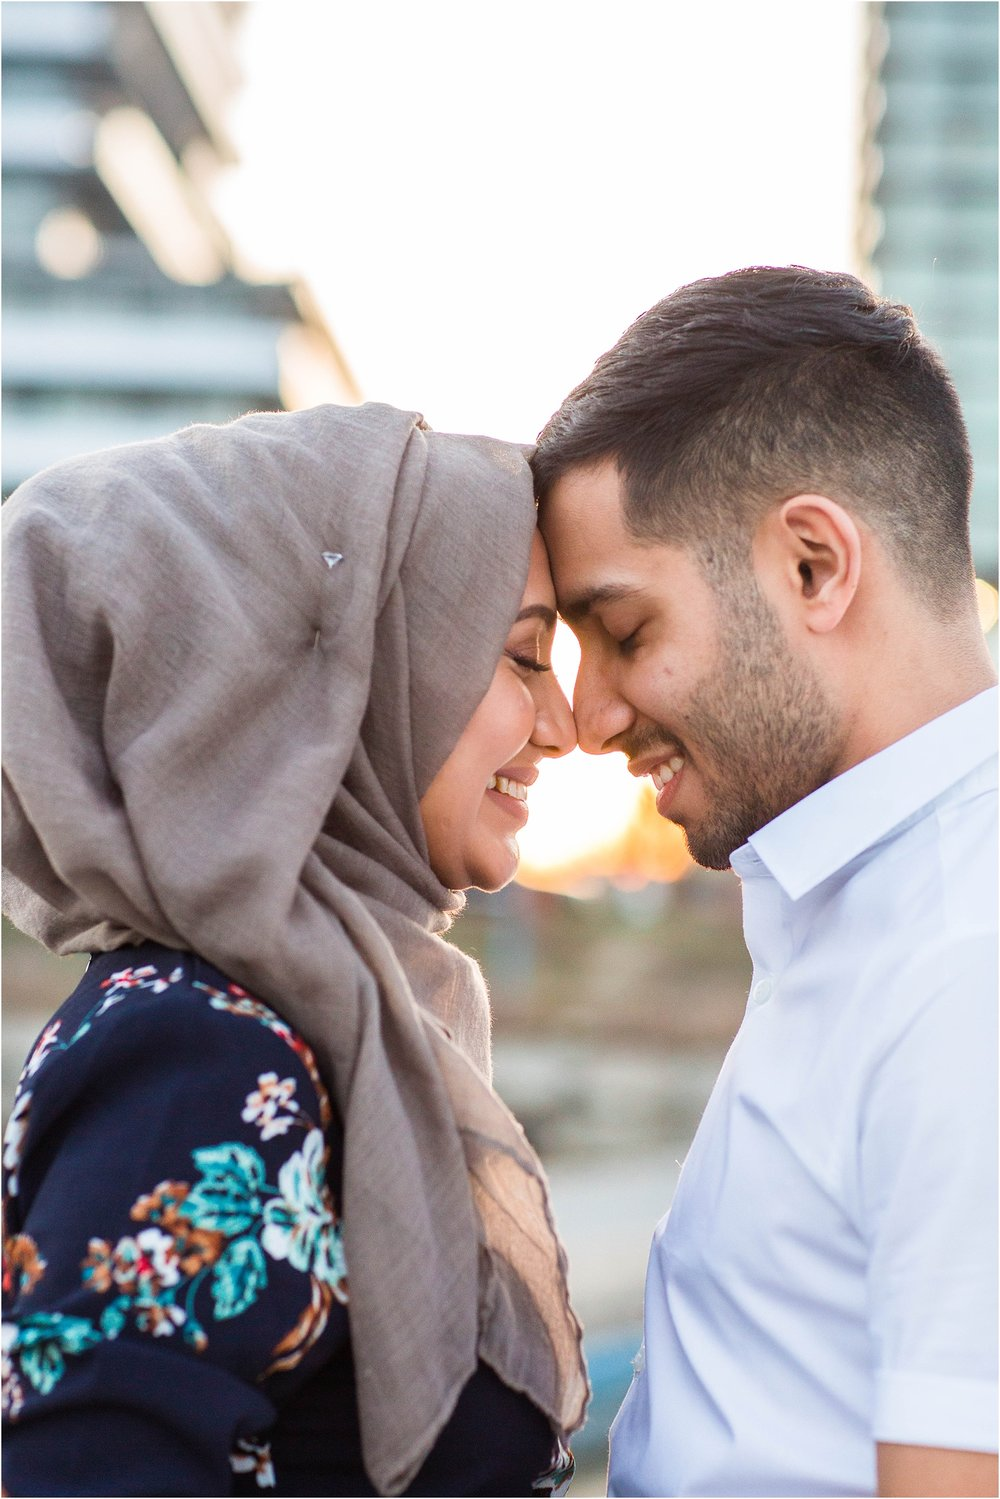 Distillery-District-Humber-Bay-Park-Engagement-Toronto-Mississauga-Brampton-Scarborough-GTA-Pakistani-Indian-Wedding-Engagement-Photographer-Photography_0049.jpg